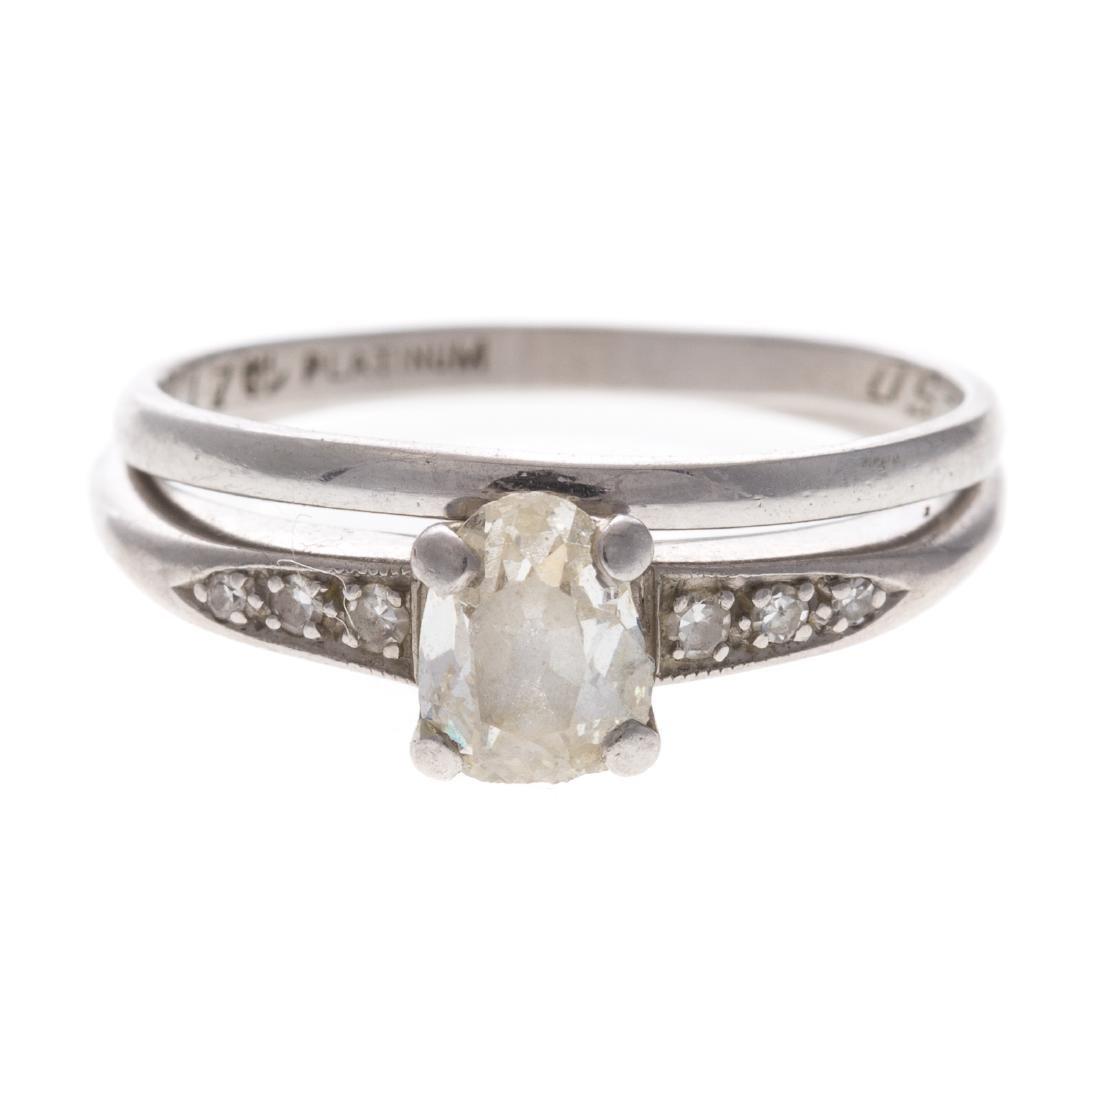 A Vintage Diamond Wedding Set in Platinum